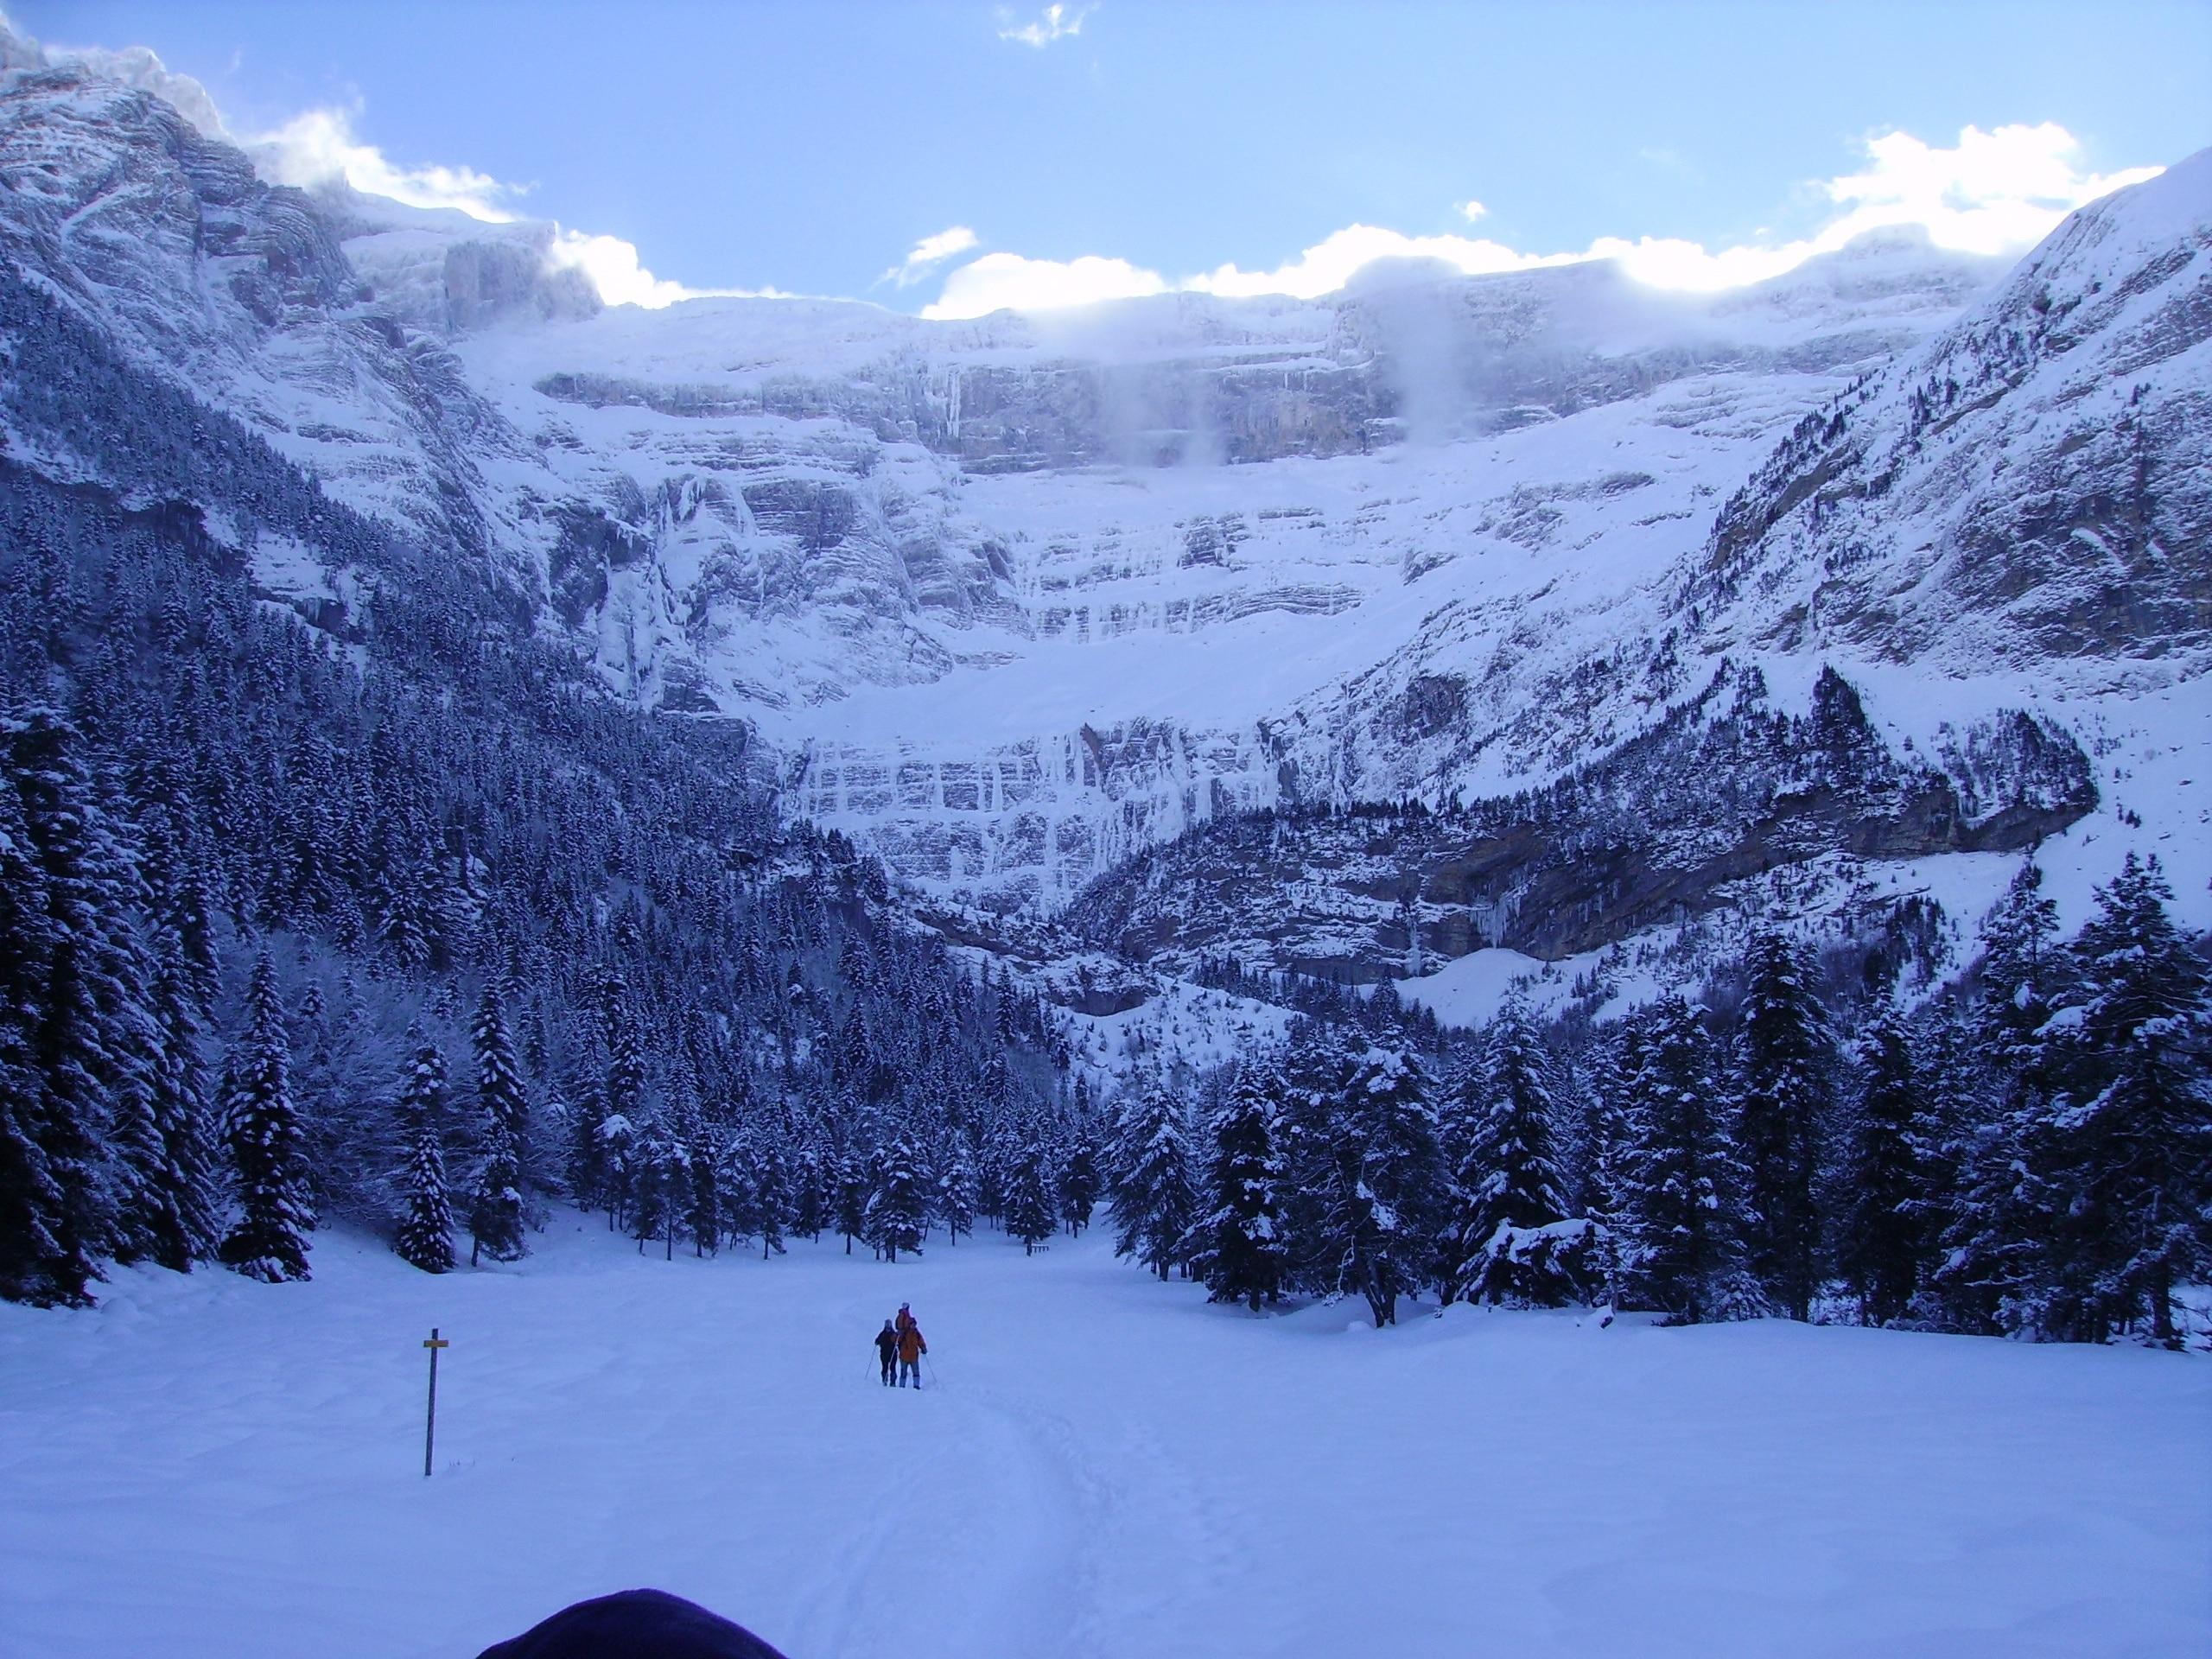 Gavarnie-Gedre, Hautes-Pyrenees, France